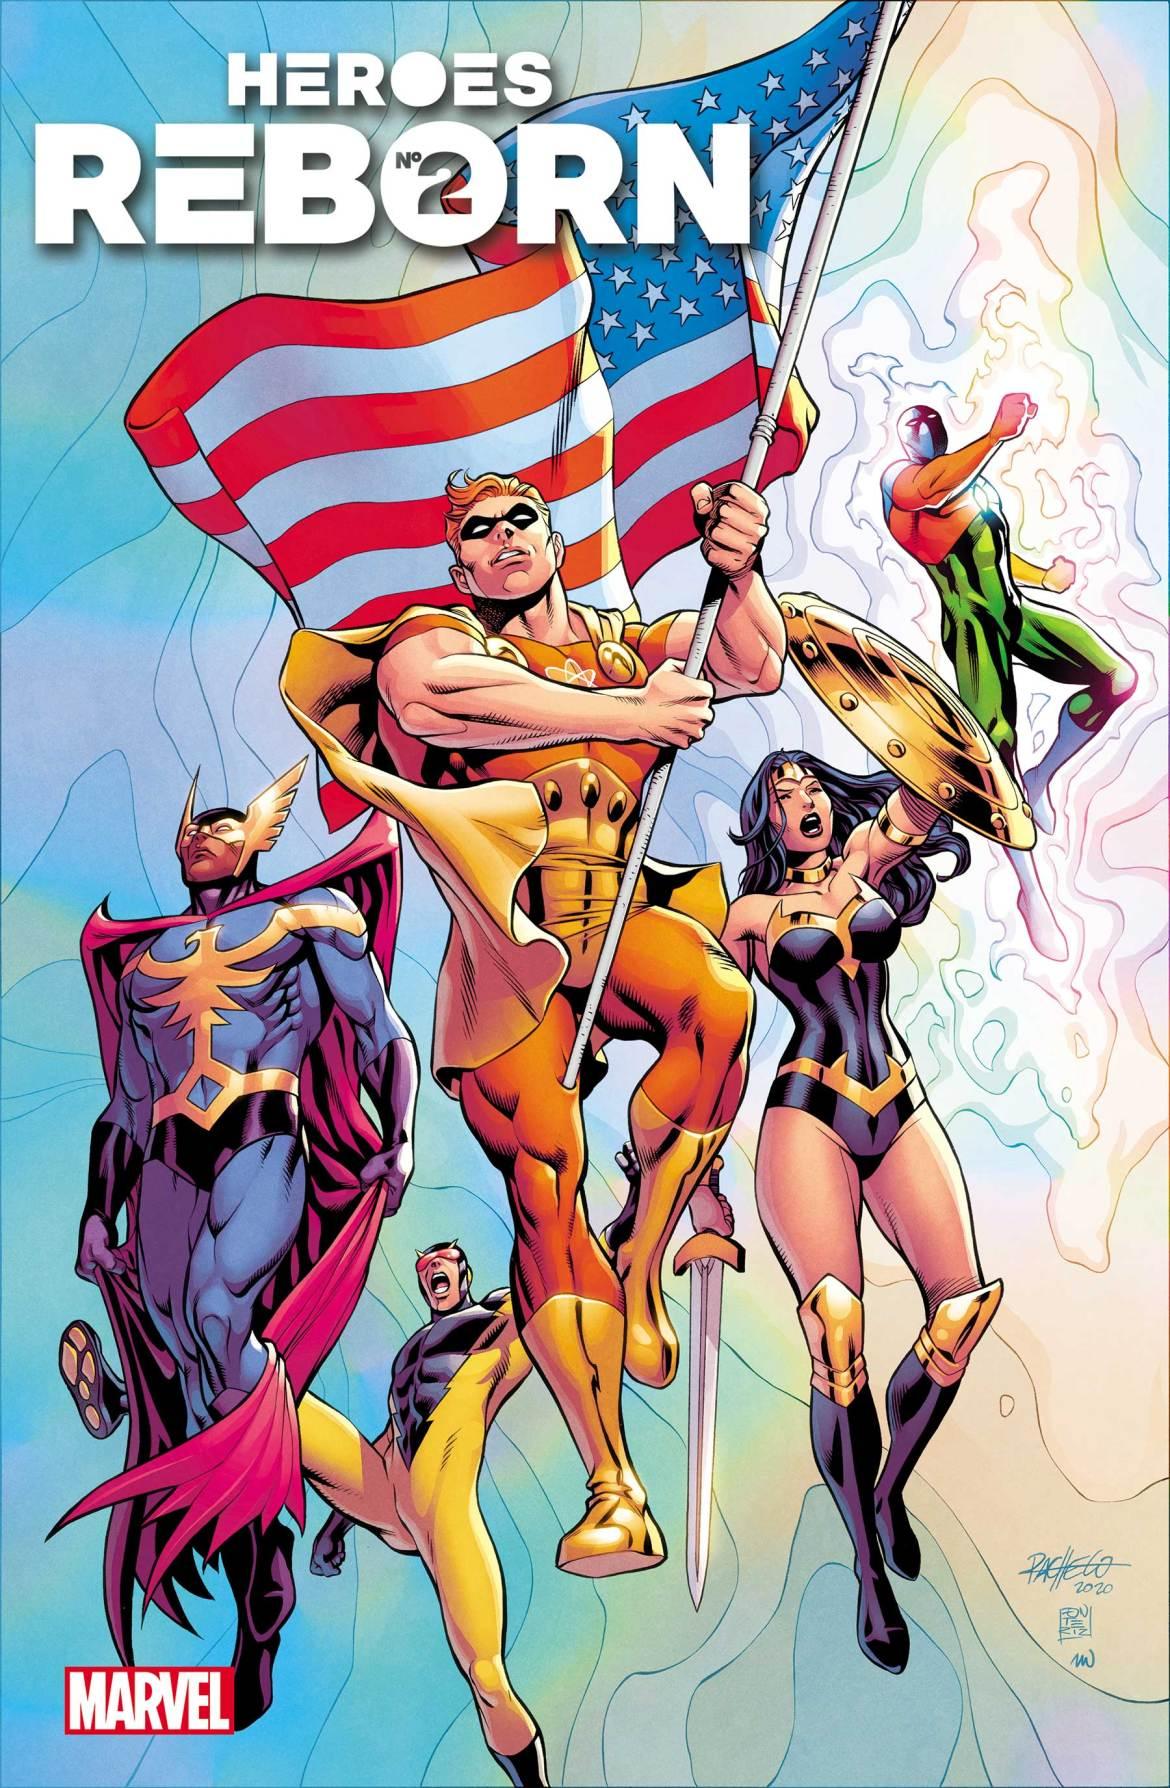 HEROESREBORN2021002_Pacheco_Var Marvel Comics May 2021 Solicitations